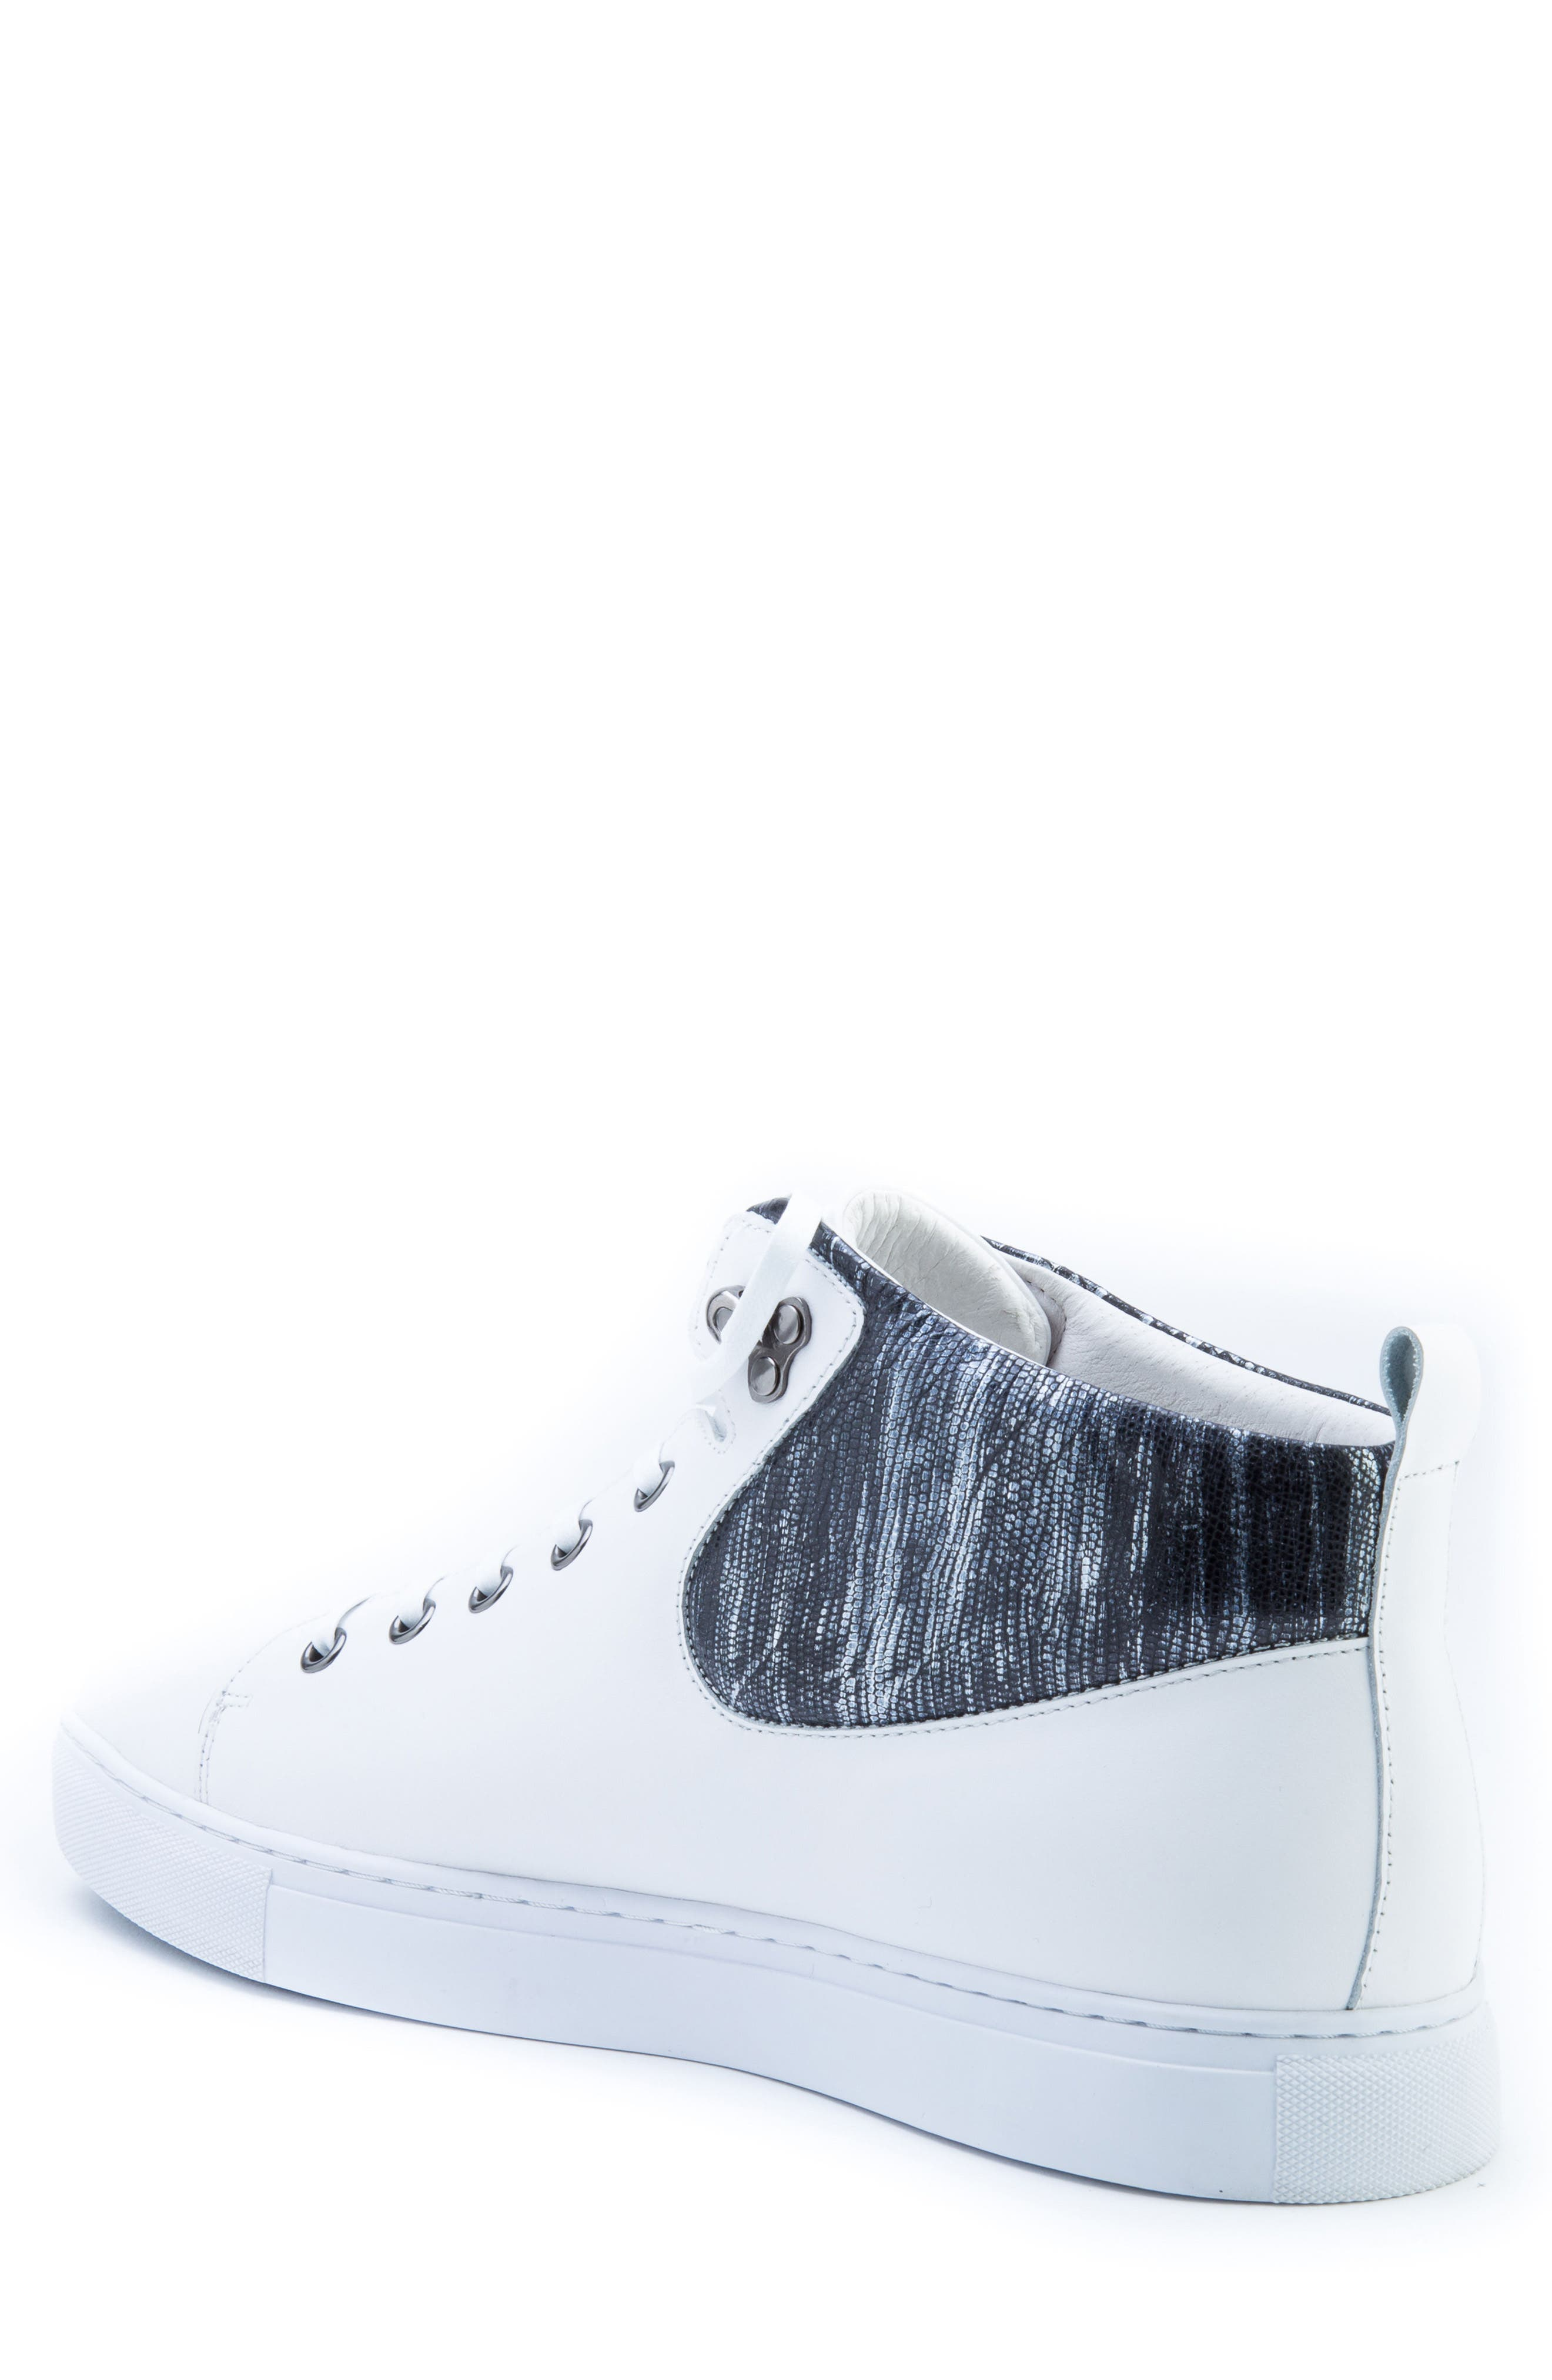 Carroll Sneaker,                             Alternate thumbnail 2, color,                             White Leather